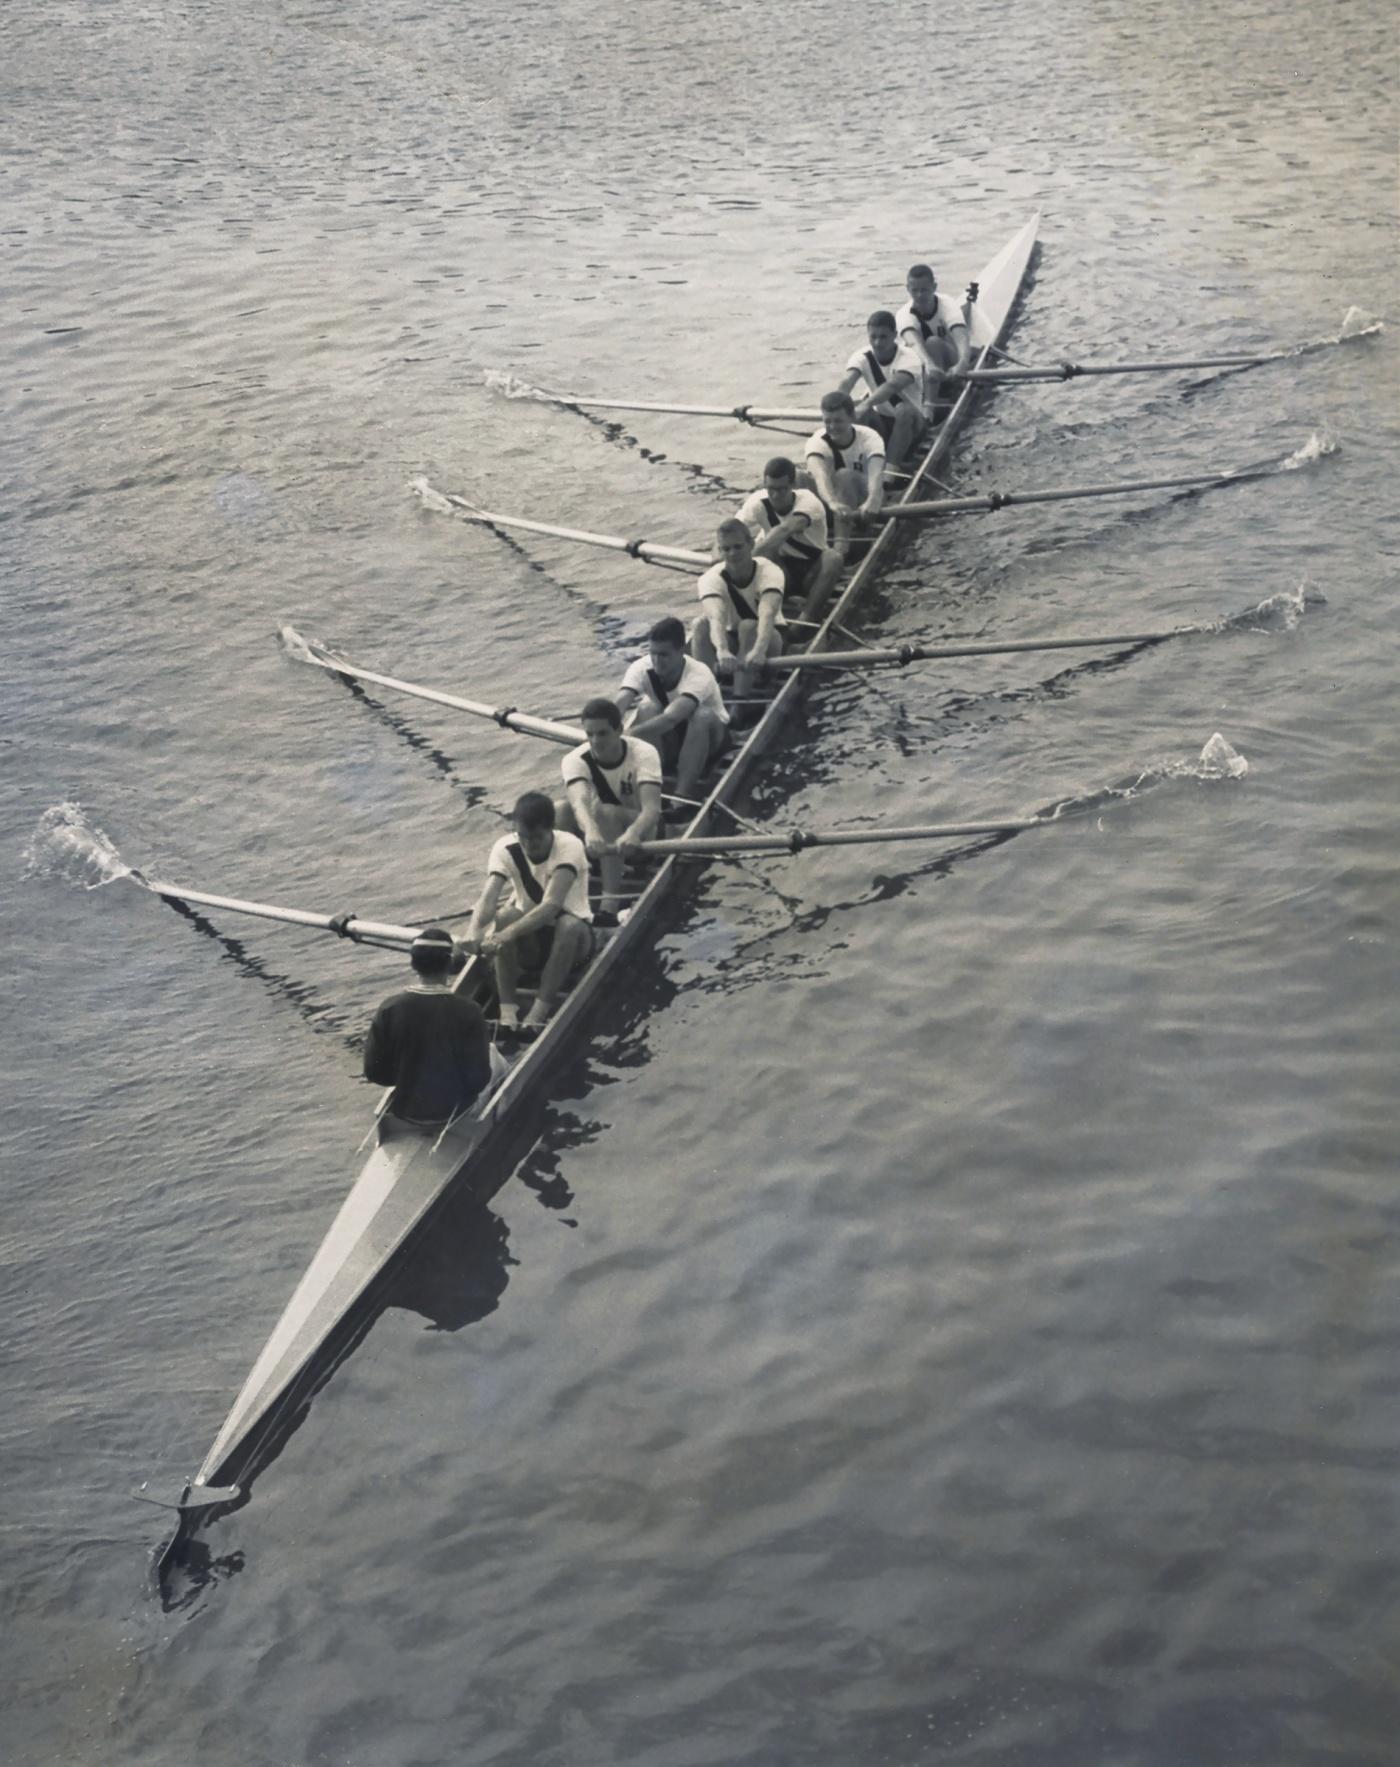 overhead shot of the varsity rowing team 1960